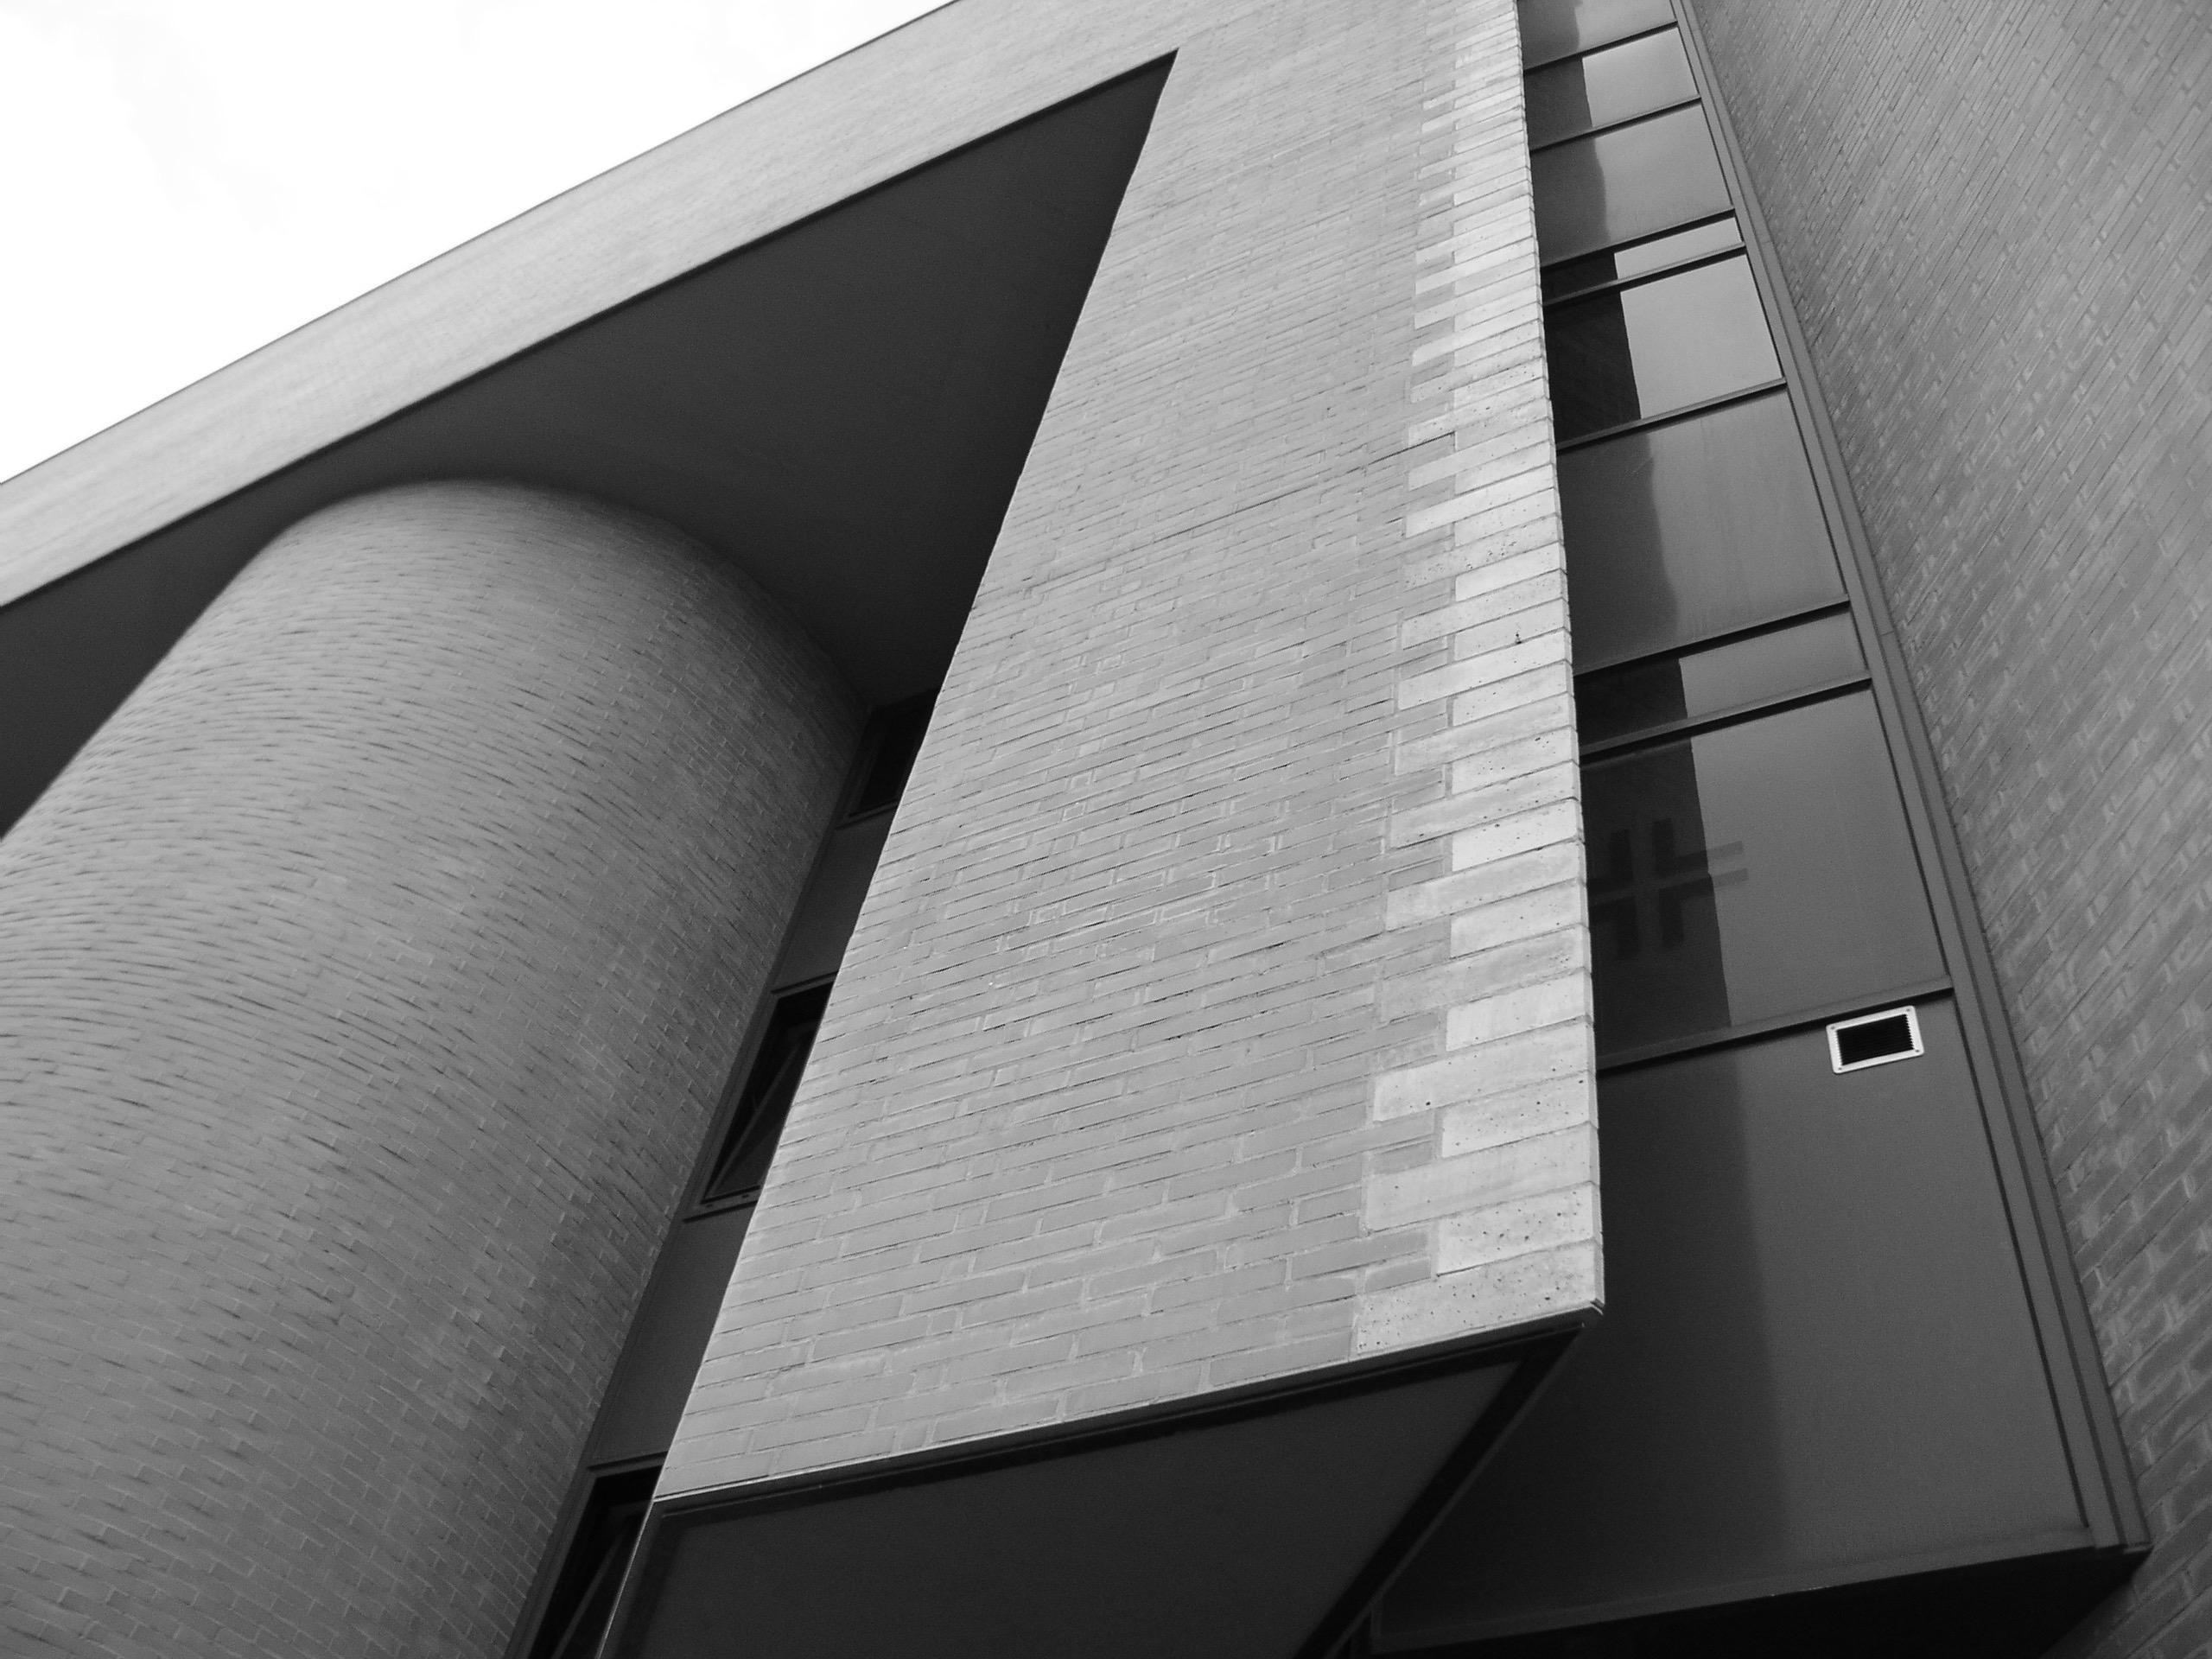 1010099 Studio Bacchi Architetti Stadium